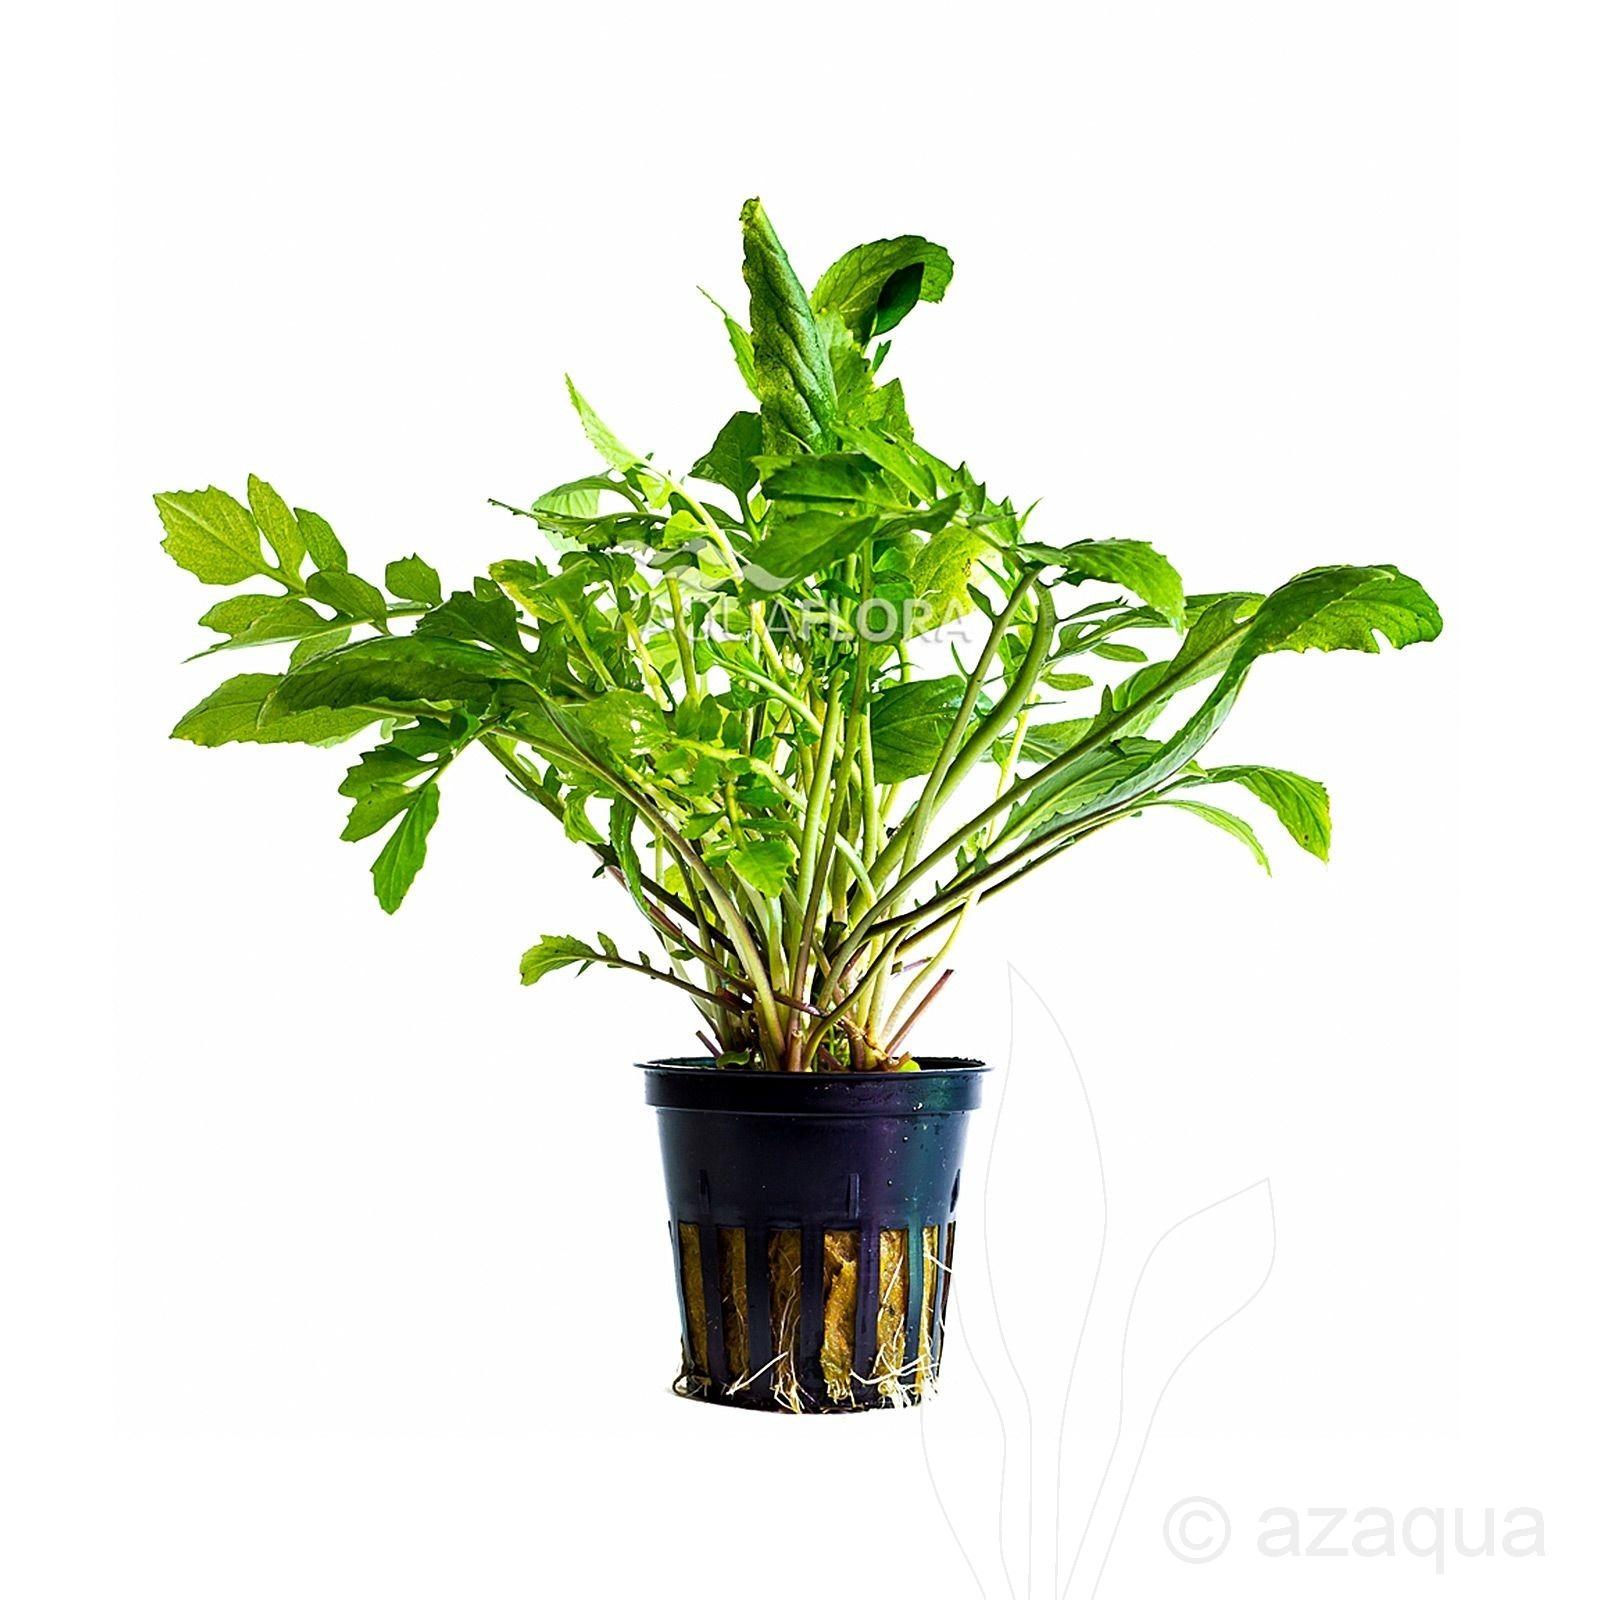 Armoracia aquatica